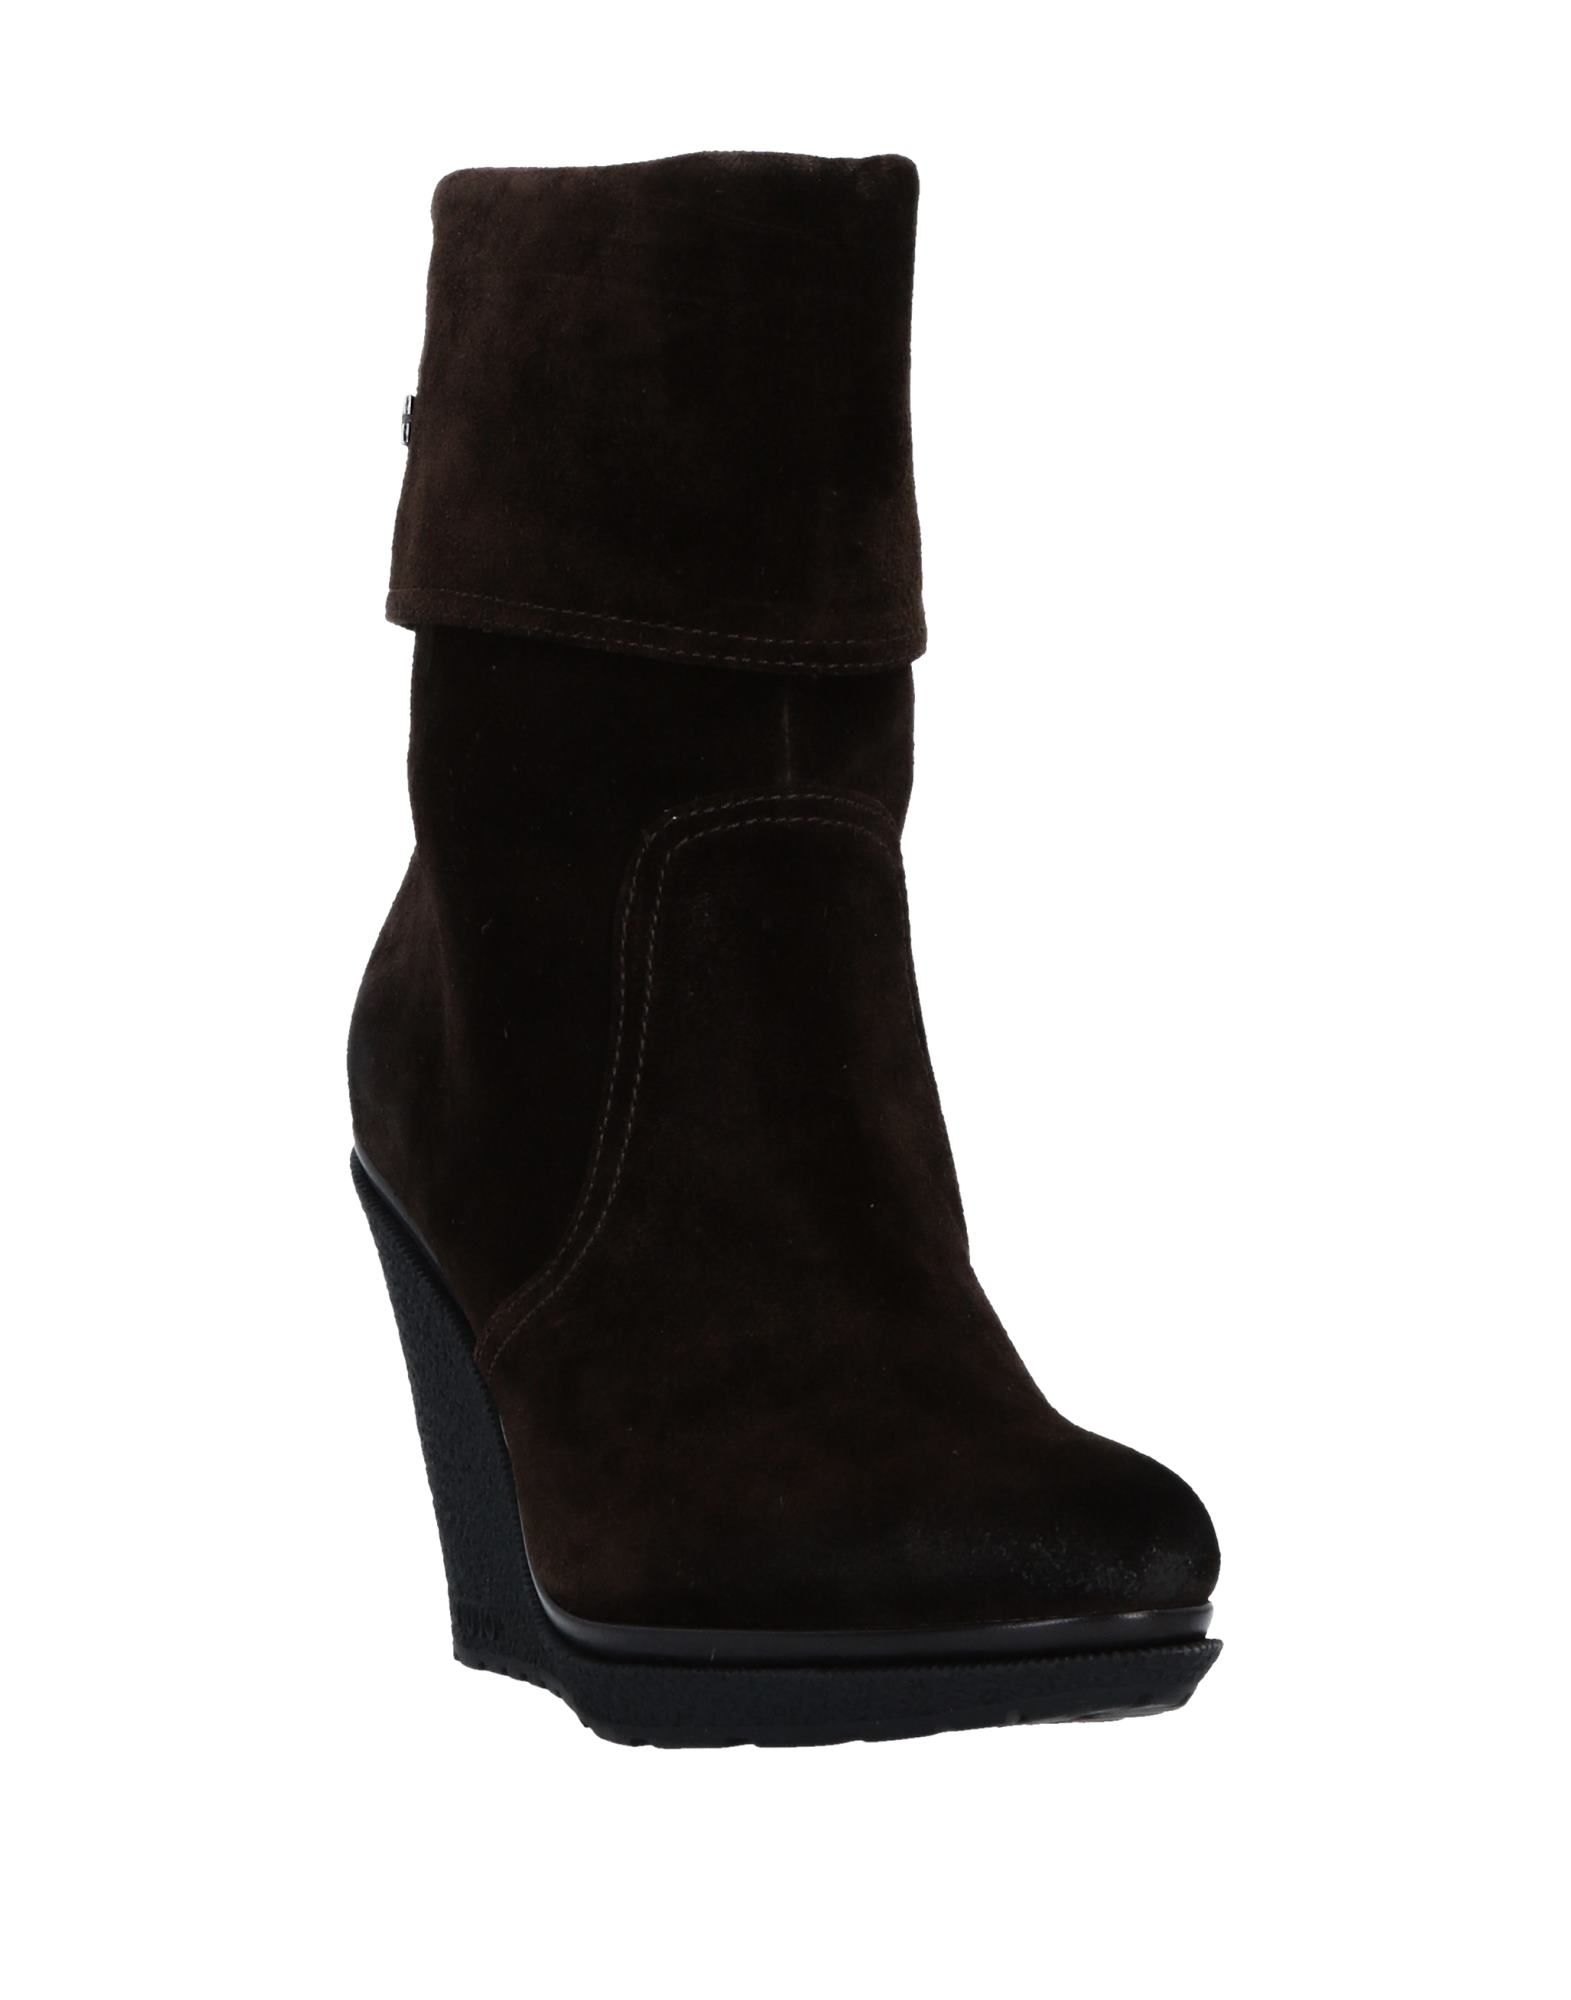 Liu •Jo Shoes Stiefelette strapazierfähige Damen  11513100WQGut aussehende strapazierfähige Stiefelette Schuhe 32a3c3